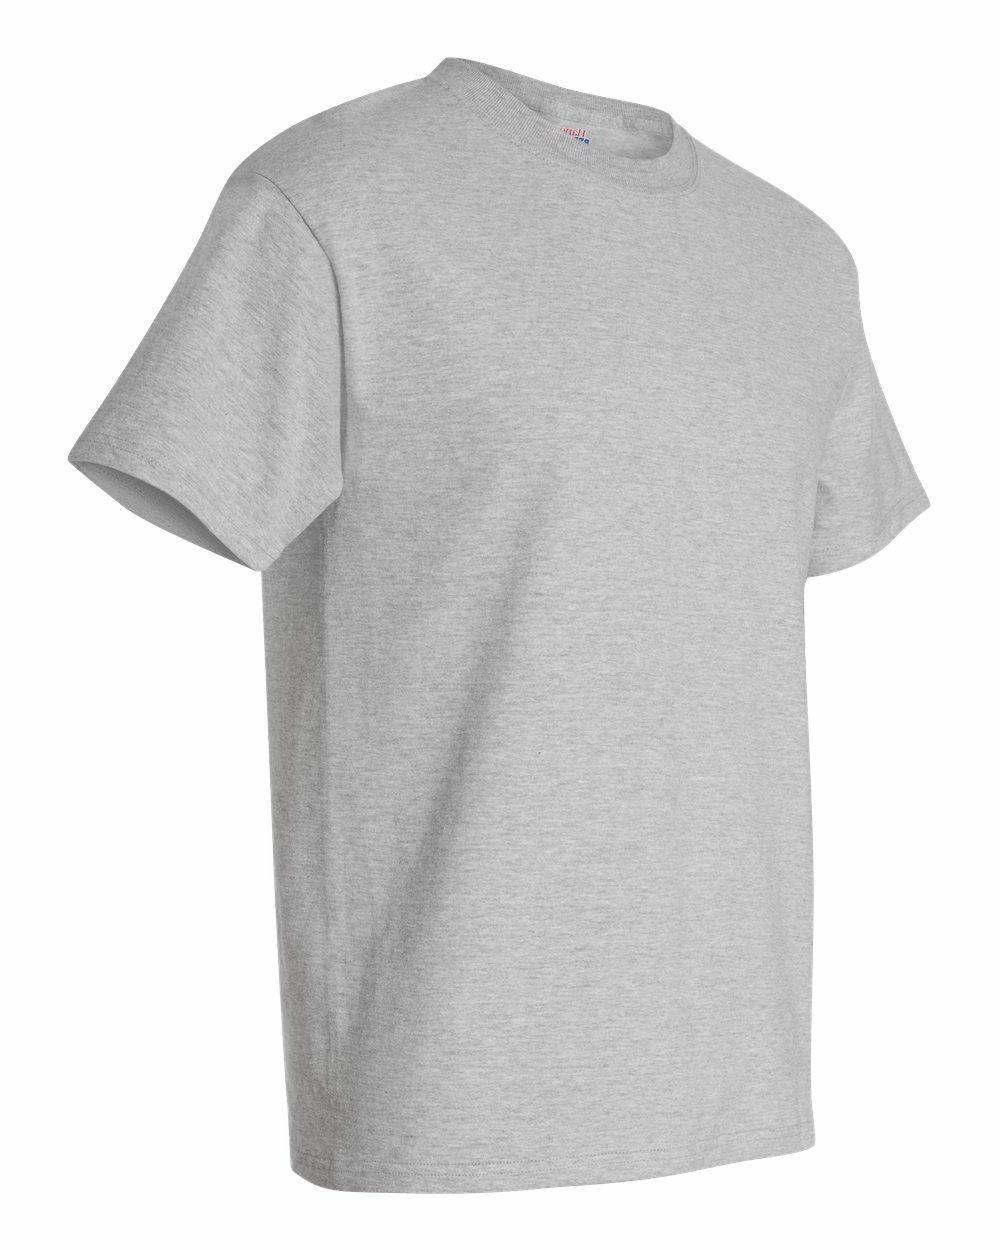 Hanes Plain Crew Adult T-Shirt